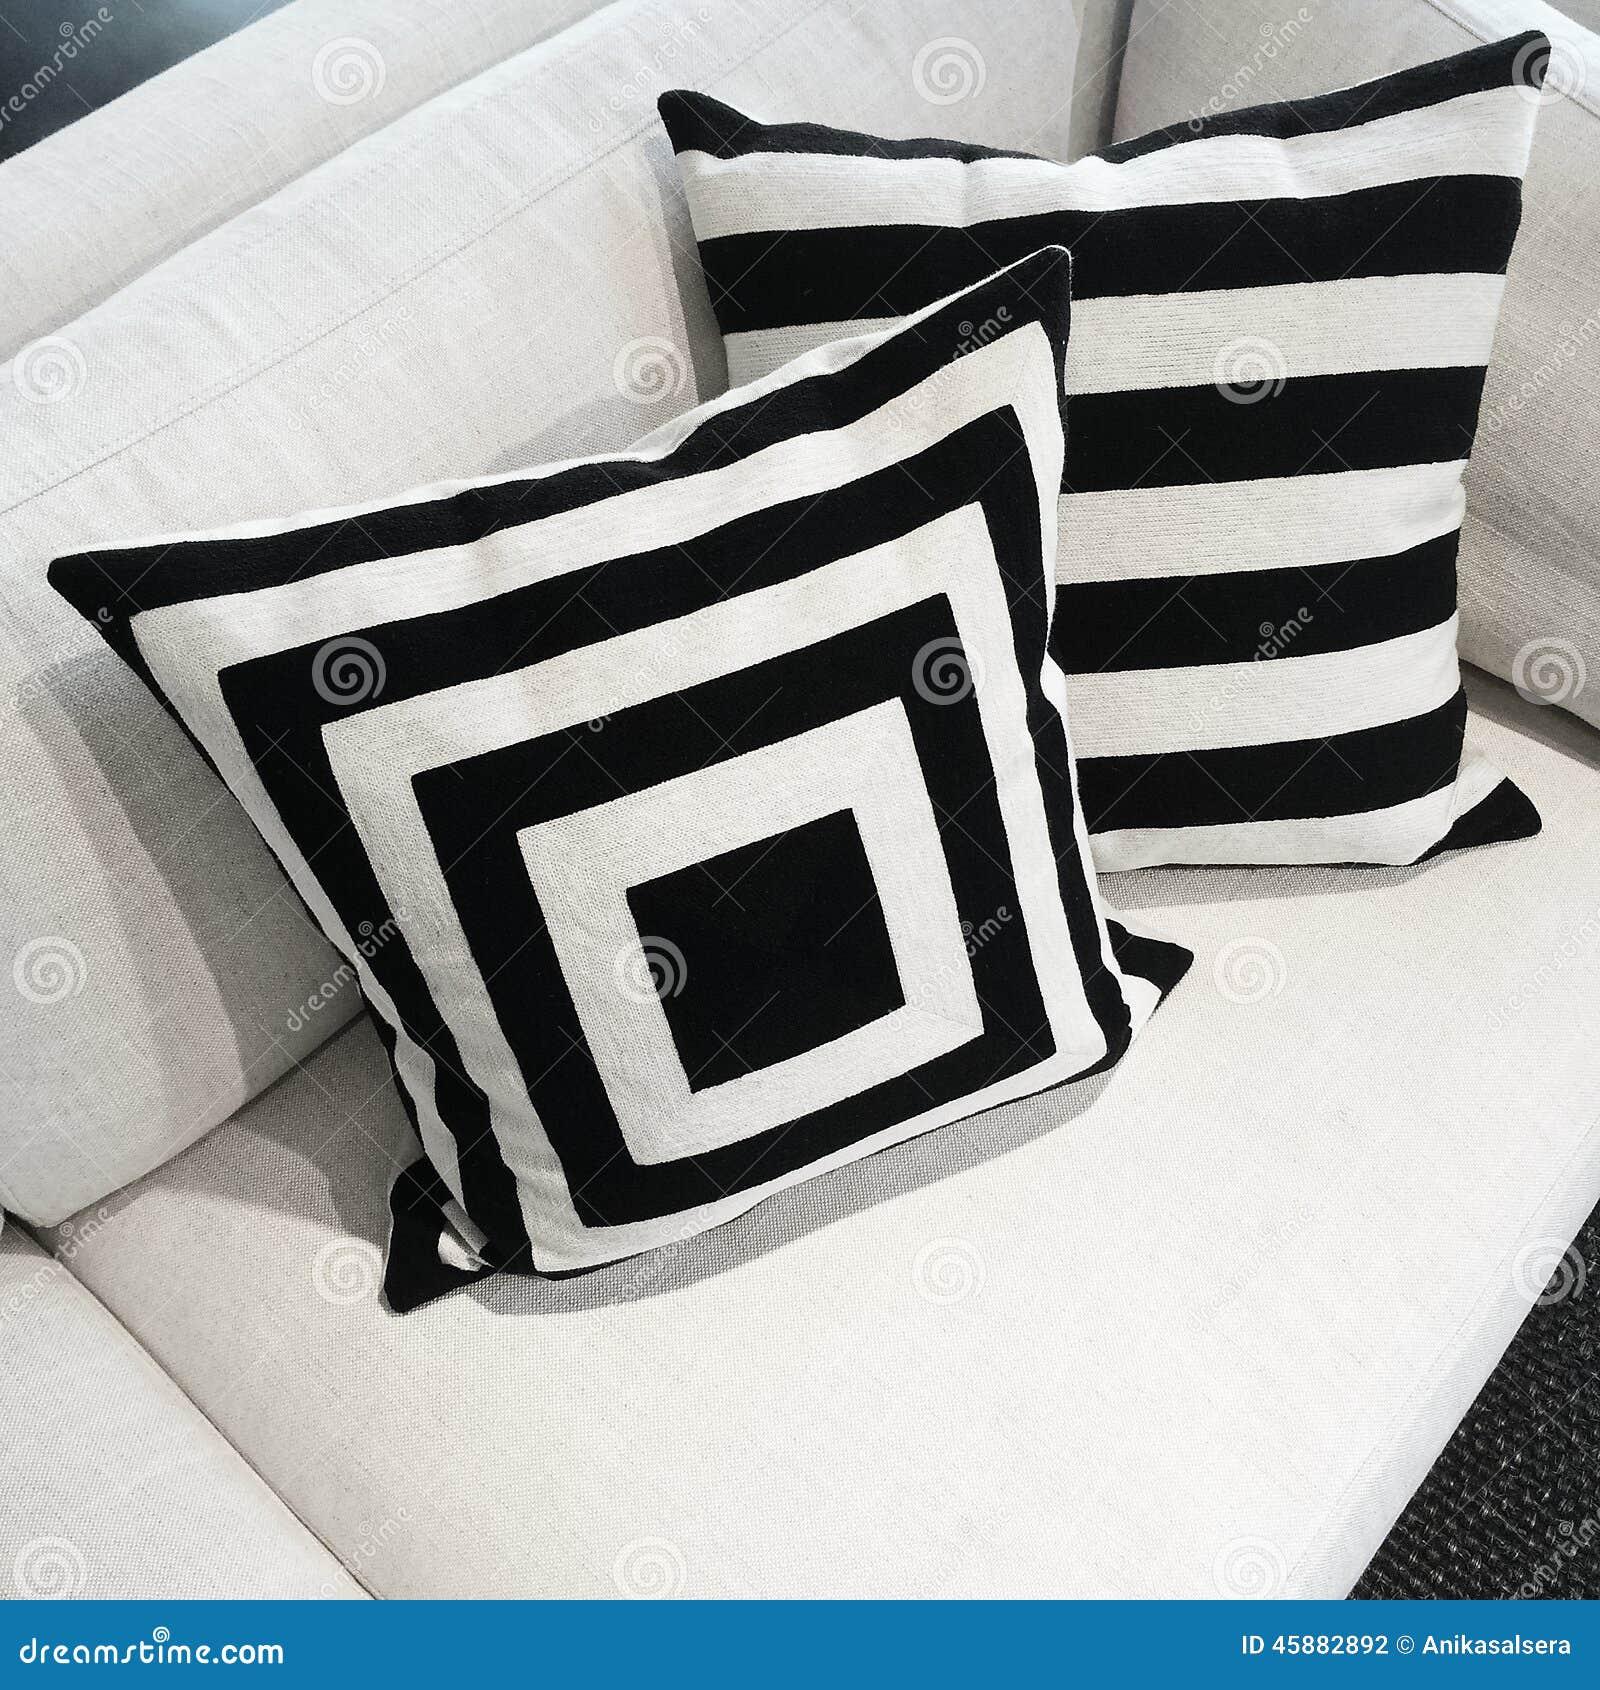 Black And White Cushions A Sofa Stock Image